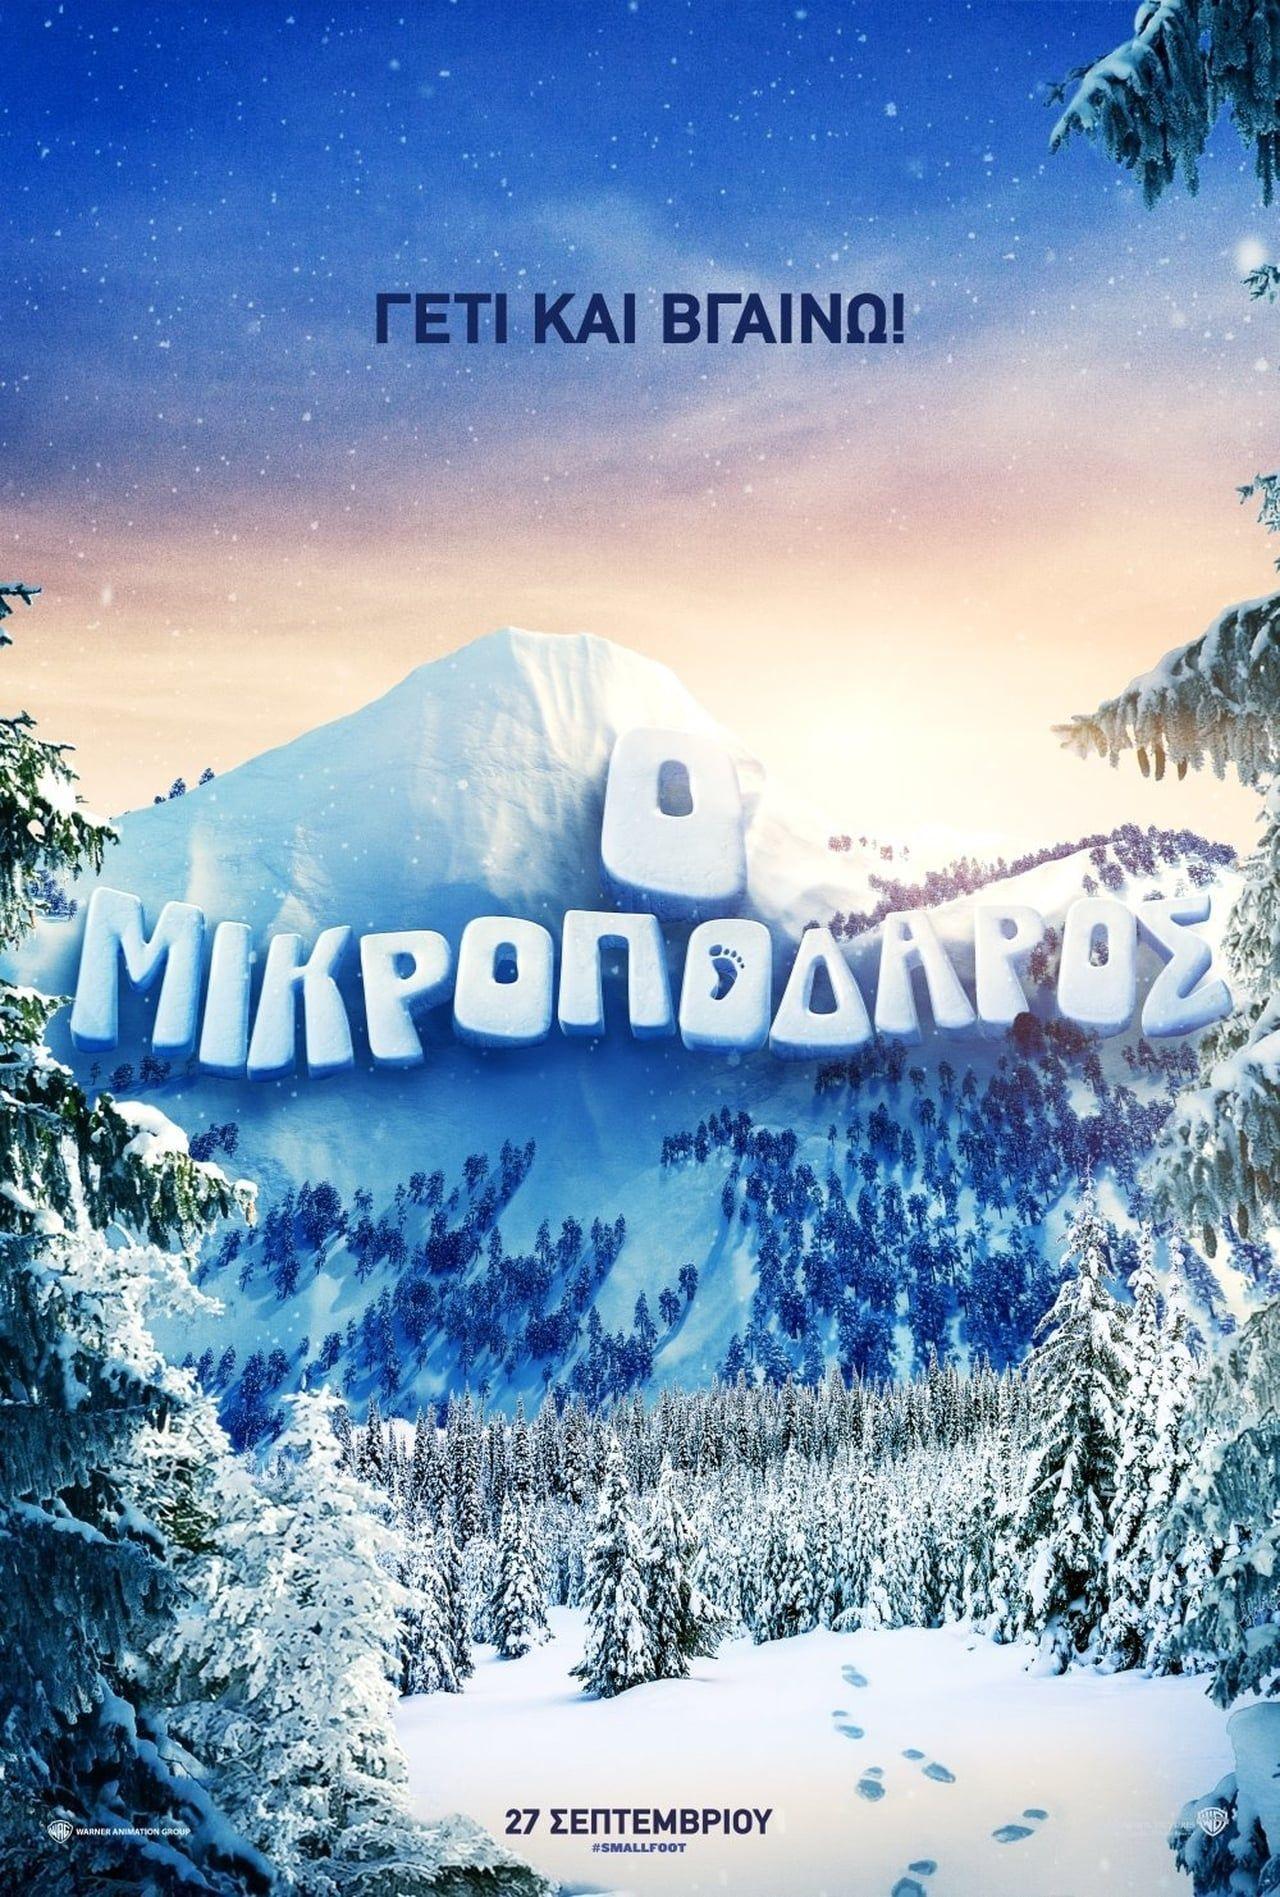 moana disney full movie in hindi free download torrent